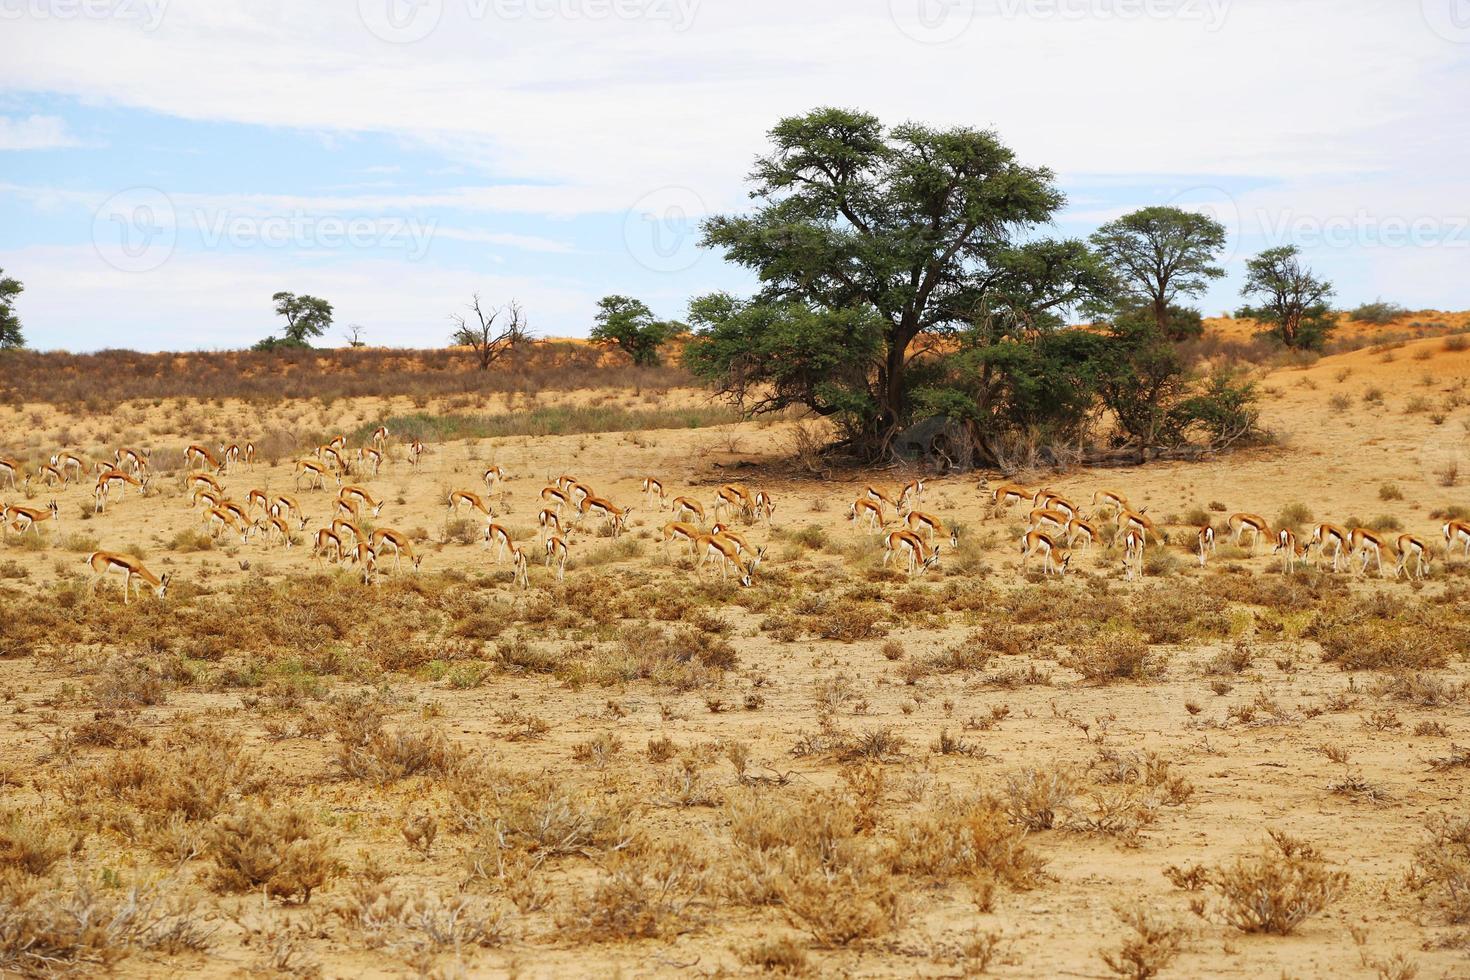 Antilopenherde in der Wüste foto